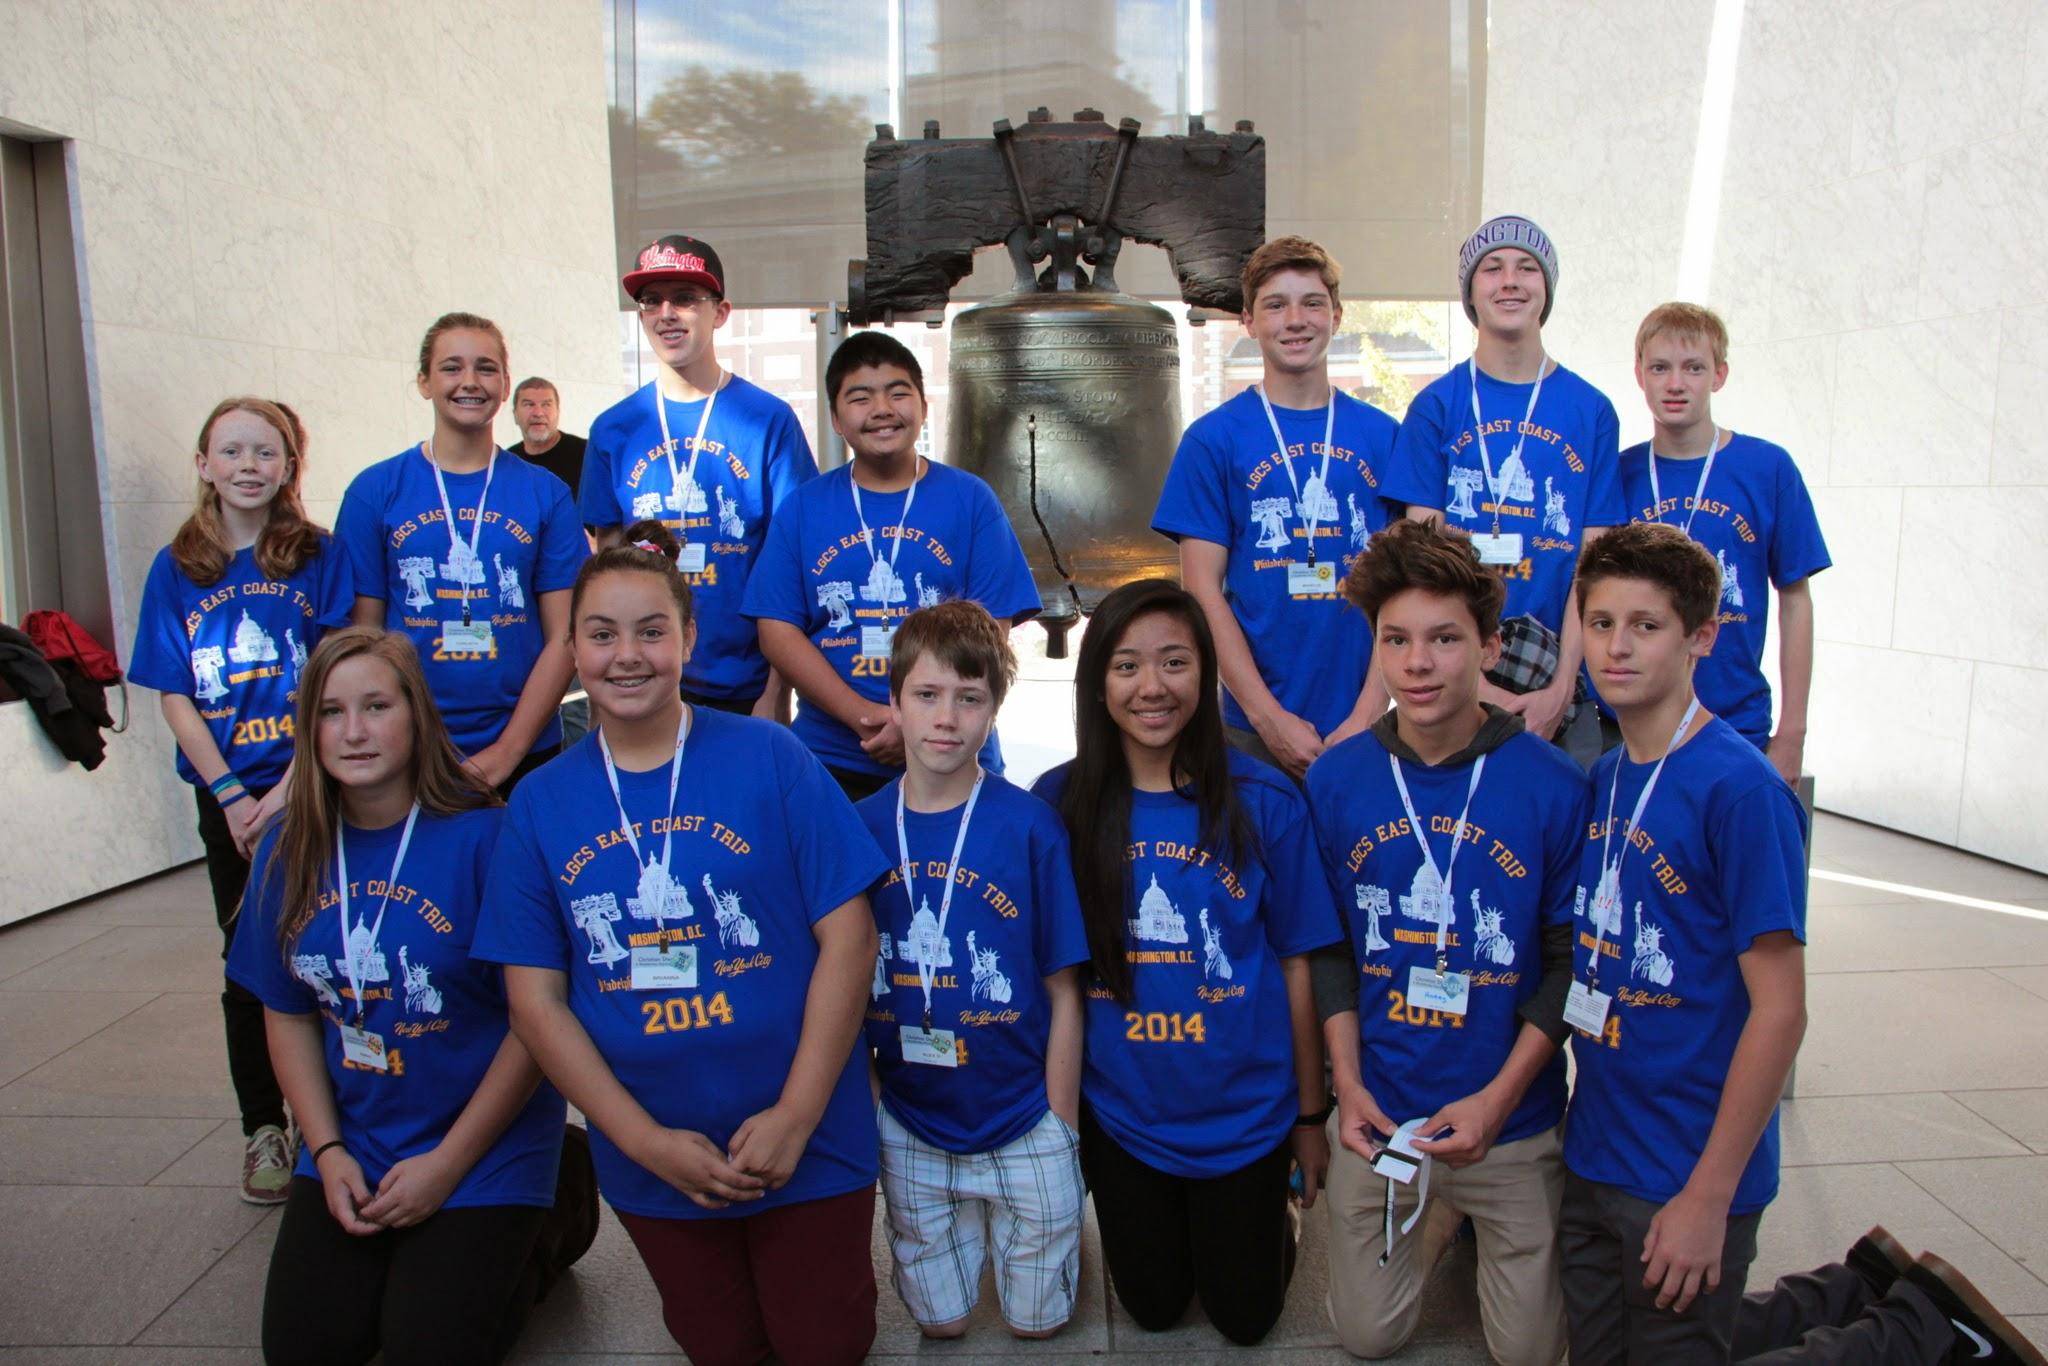 Design t shirt for group - Los Gatos Christian School East Coast Trip 2014 T Shirt Photo